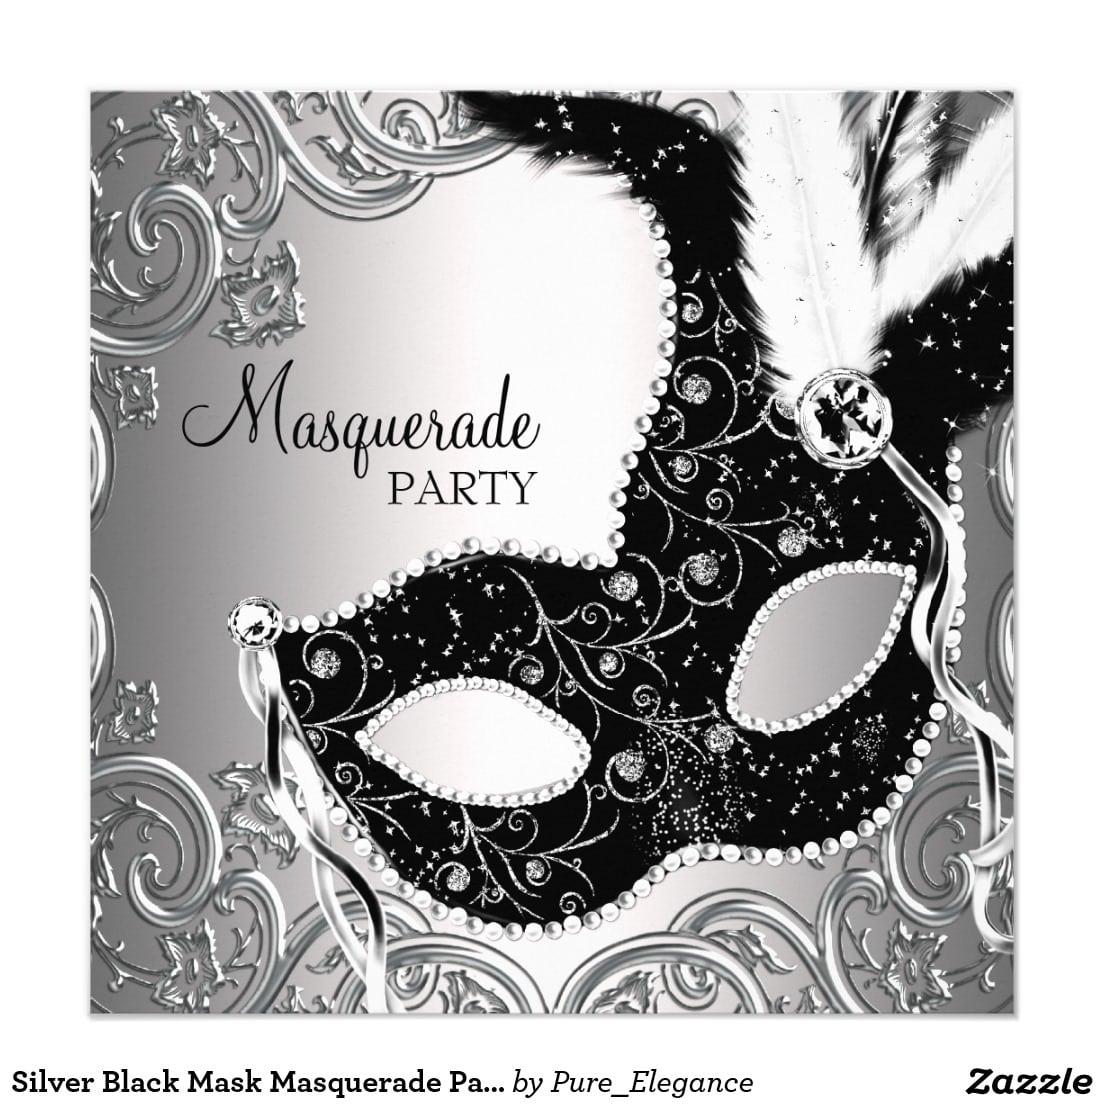 Masquerade Party Invitations Templates - Mickey Mouse Invitations ...